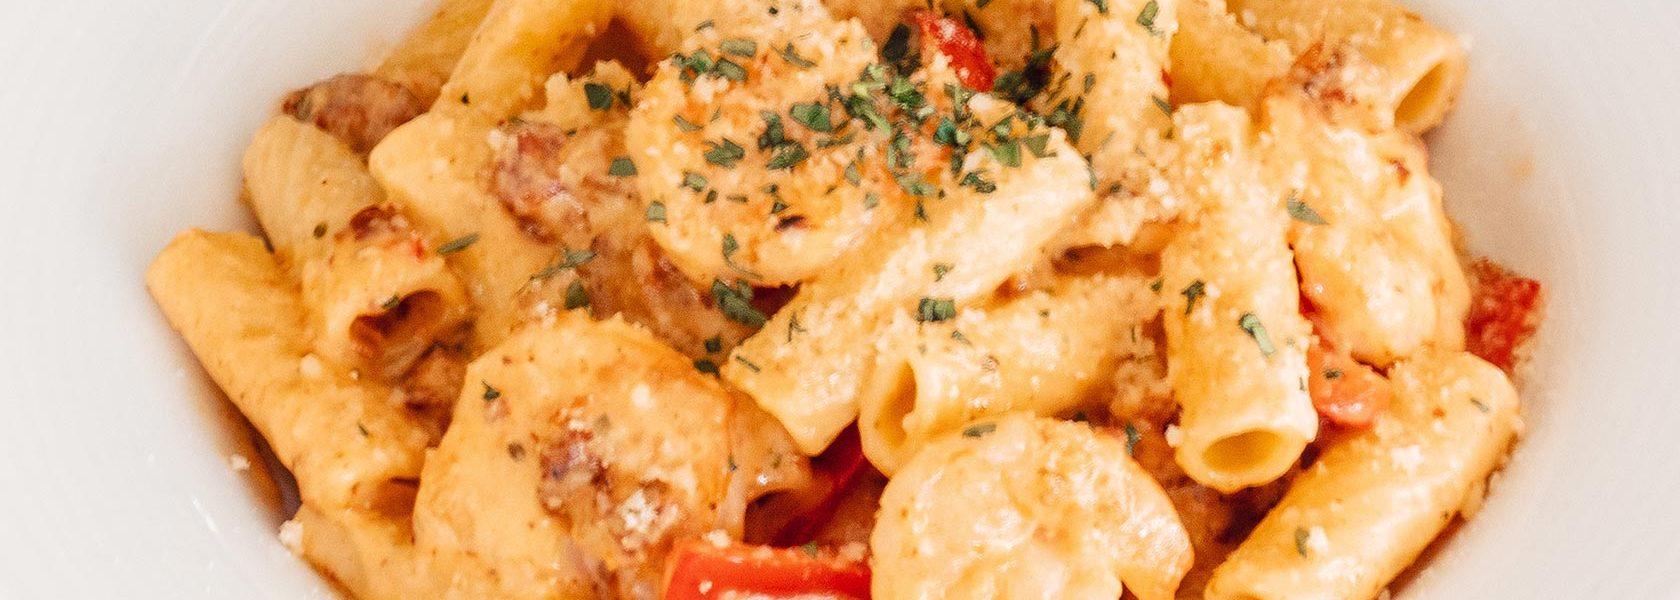 Rigatoni pasta with shrimp.